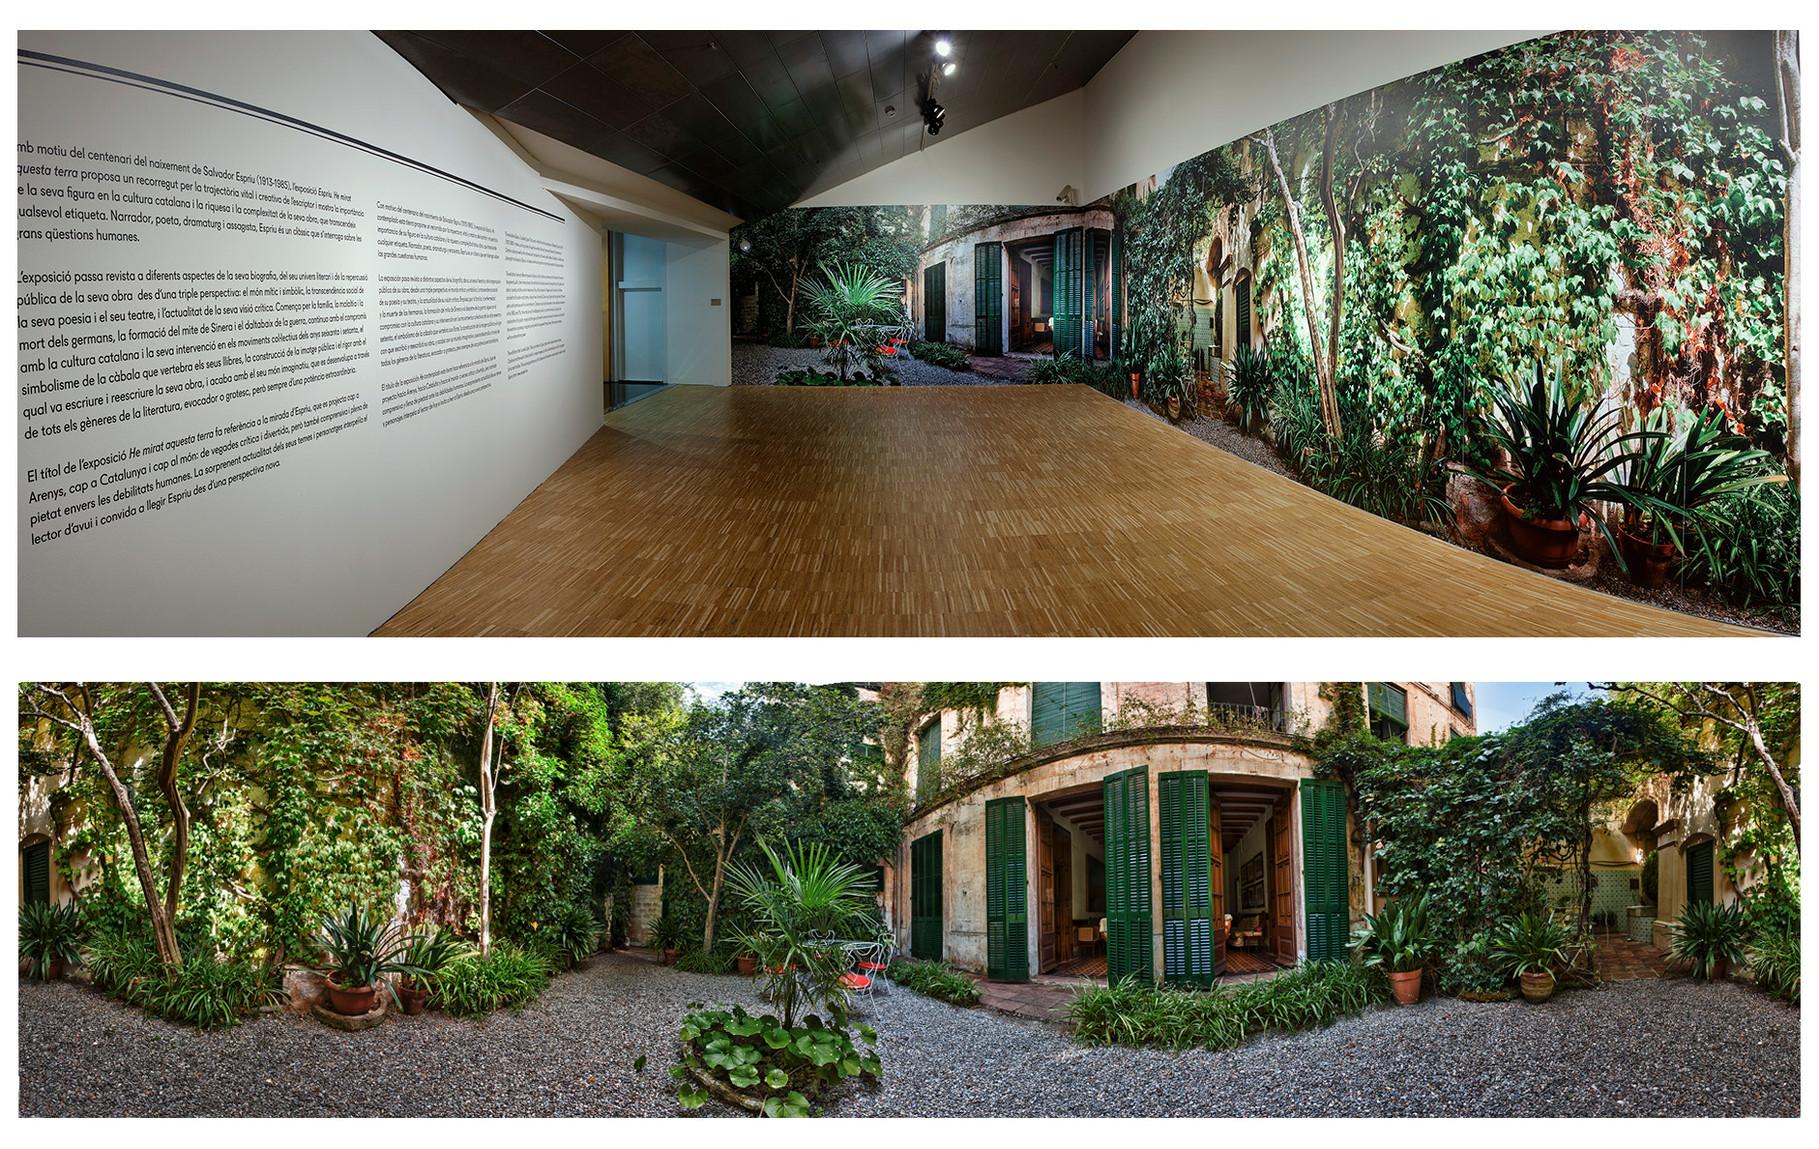 Gigantografía de 360º. CCCB (Centre de Cultura Contemporànea de Barcelona)